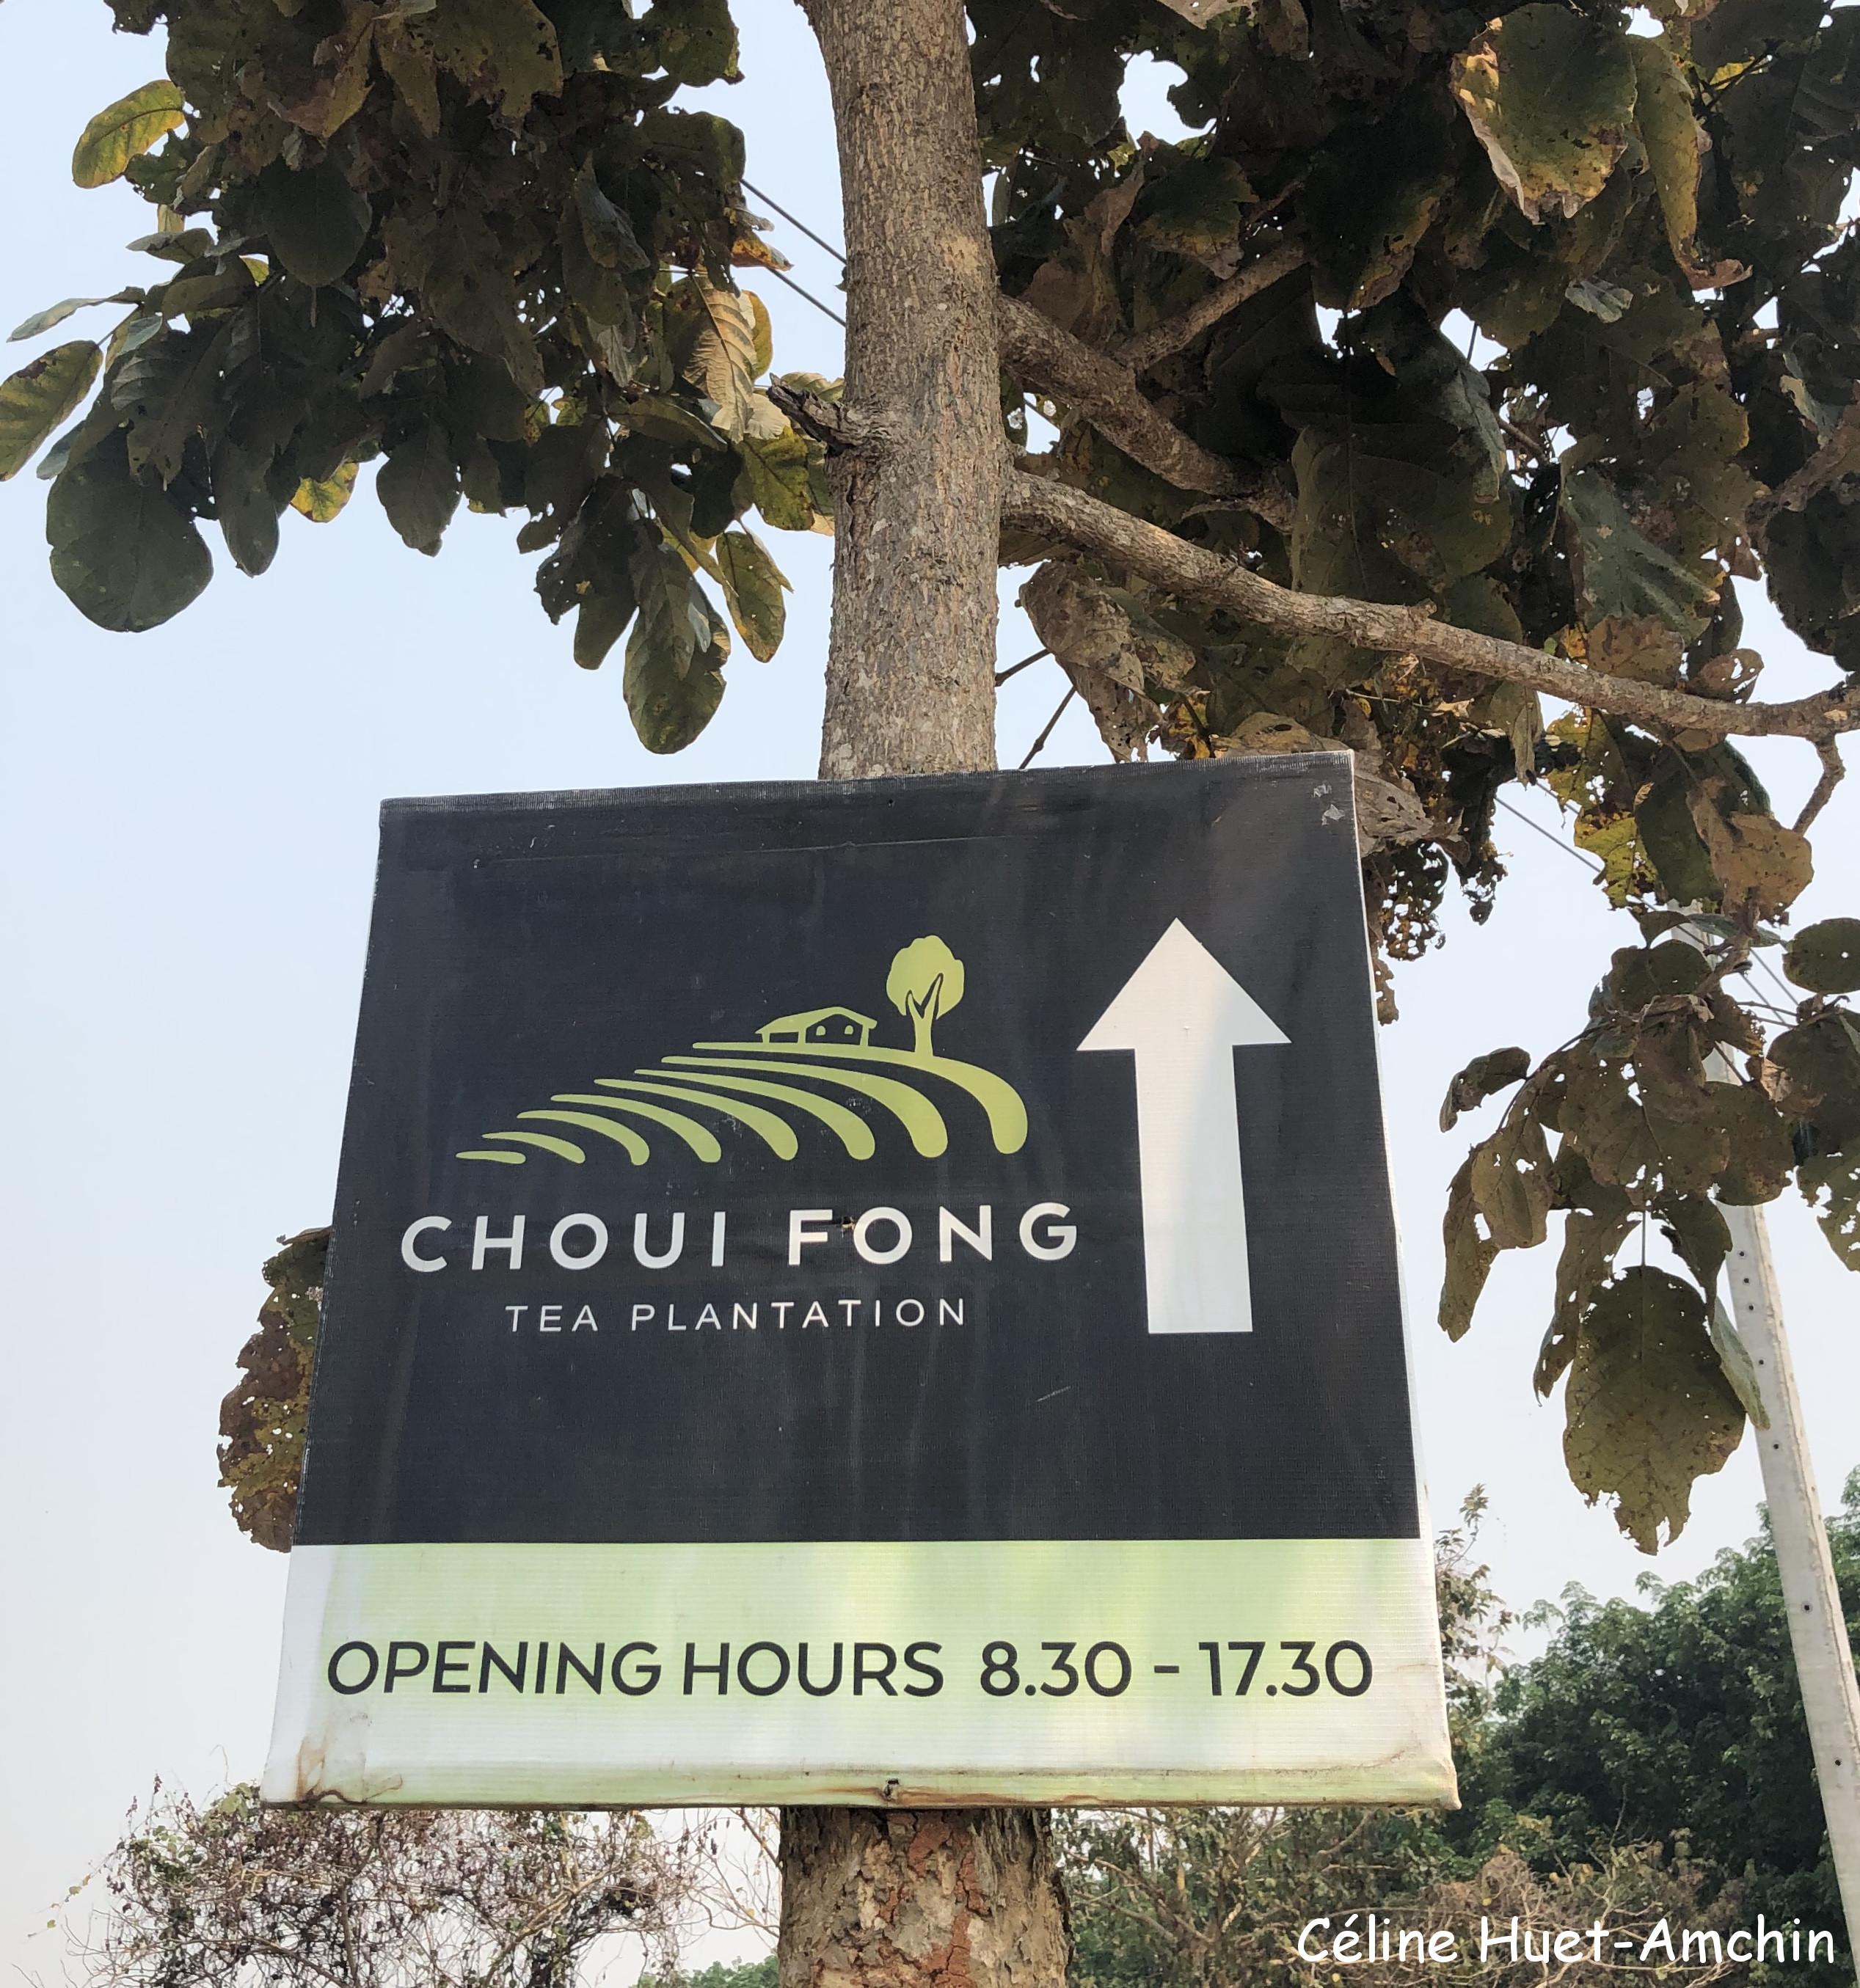 Choui Fong Tea Plantation Mae Chan Chiang Rai Thaïlande Asie